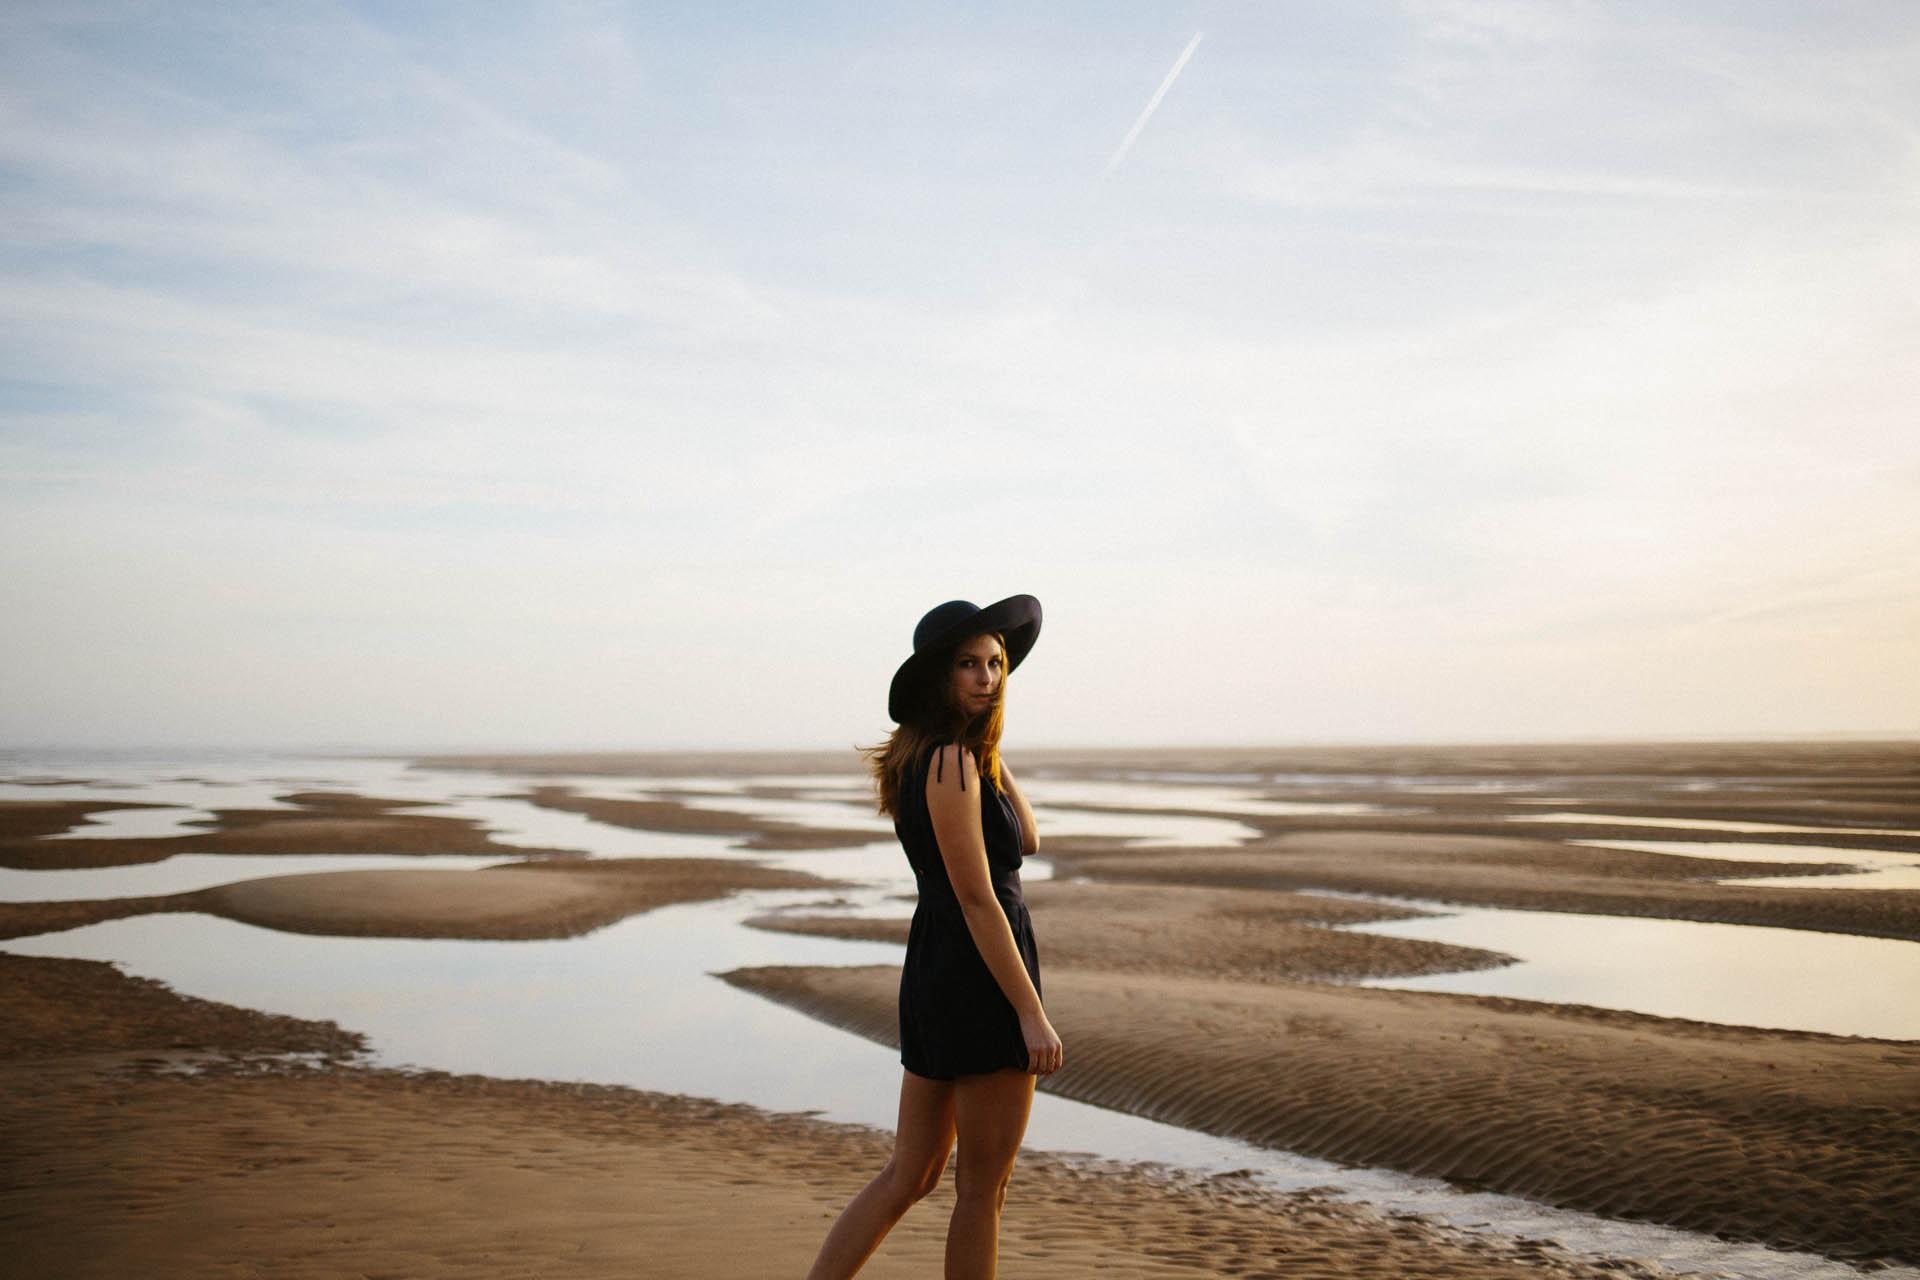 seance_portrait_marlene_vendee_flavie_nelly_paysage-81